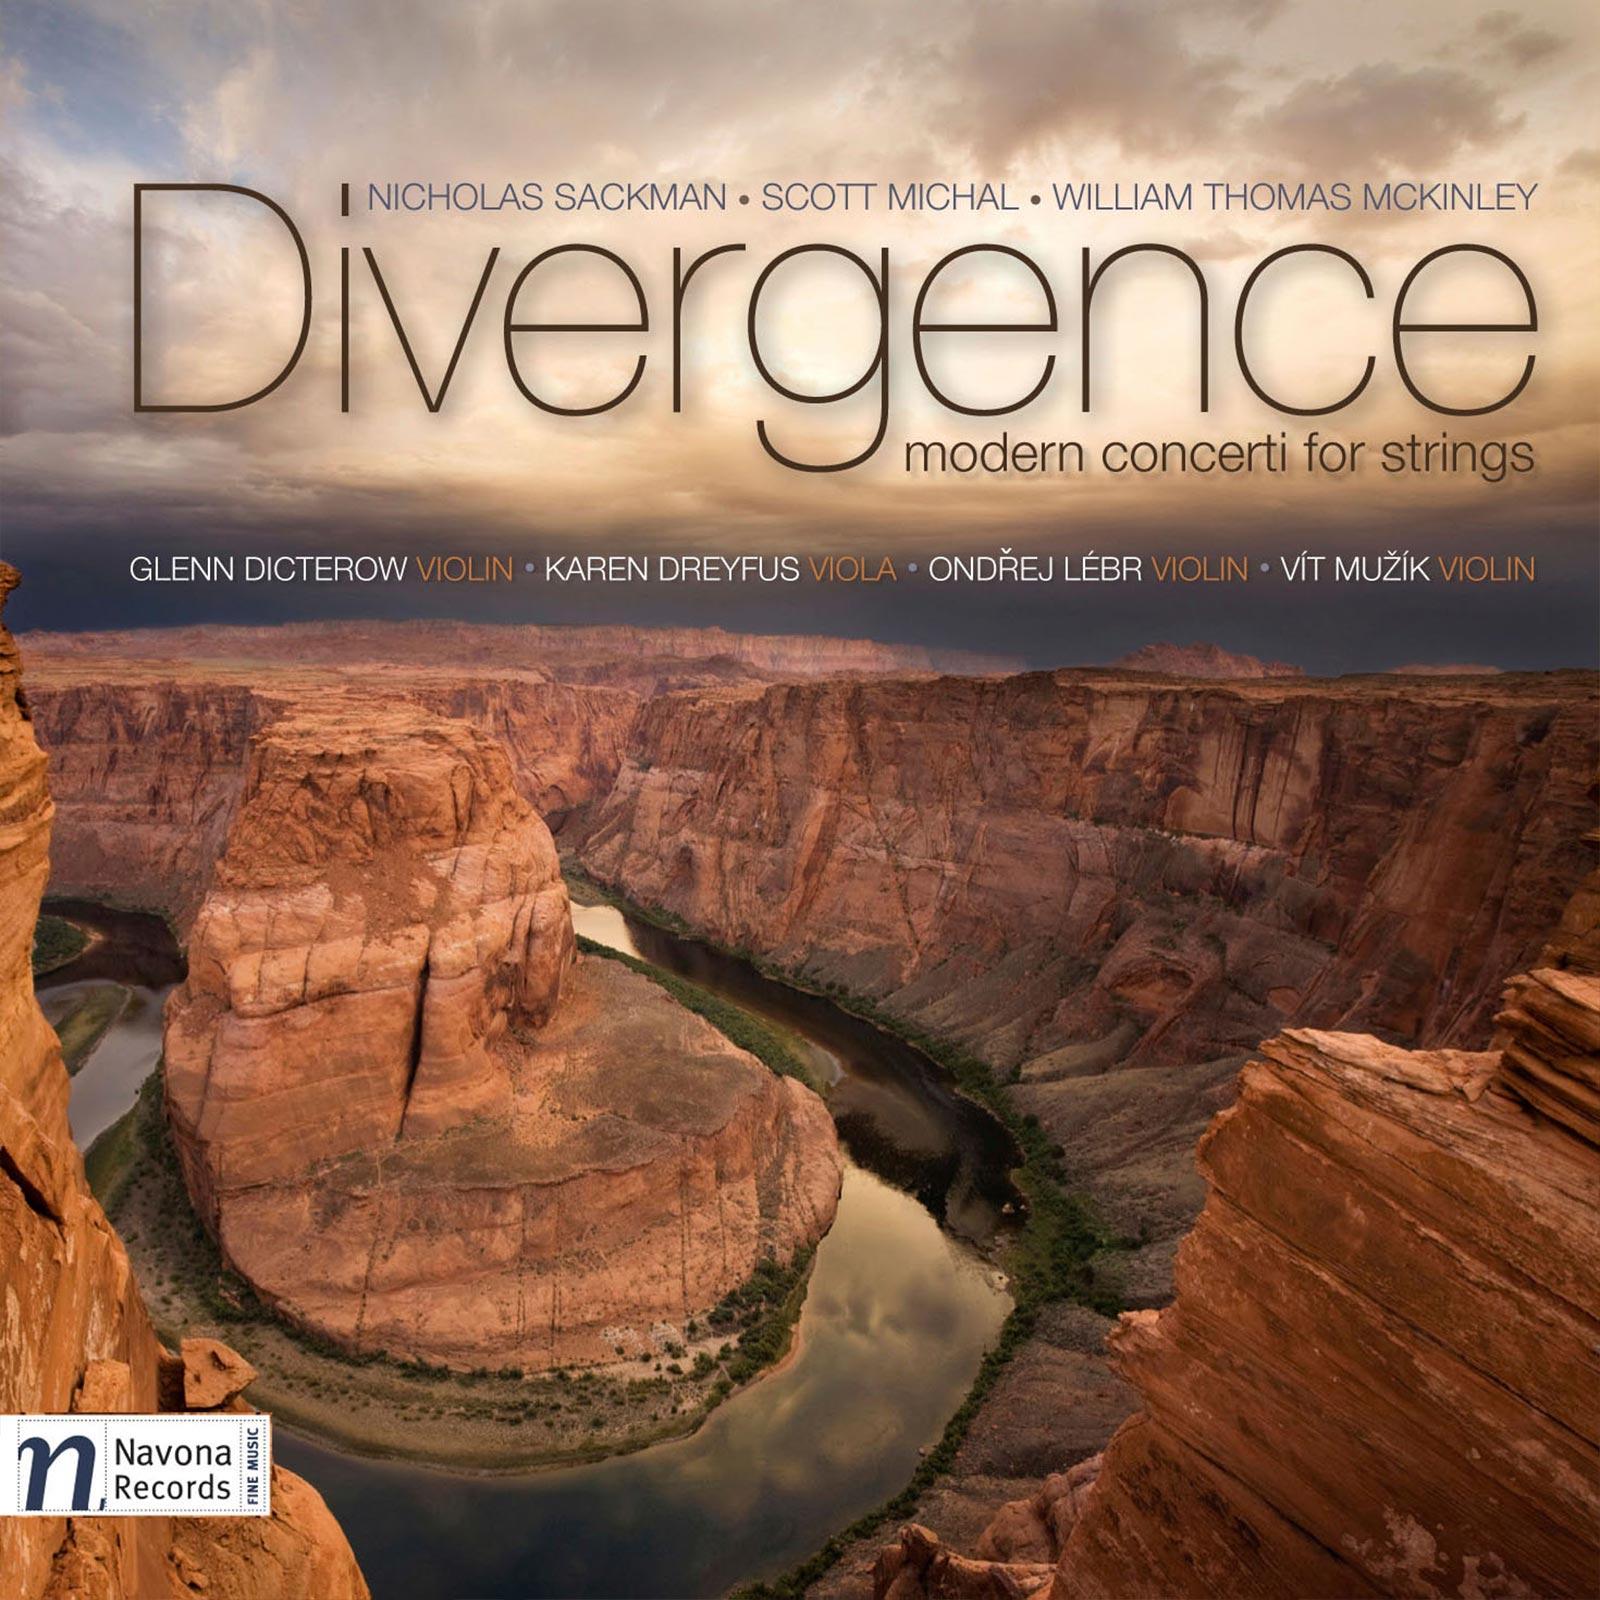 Divergence